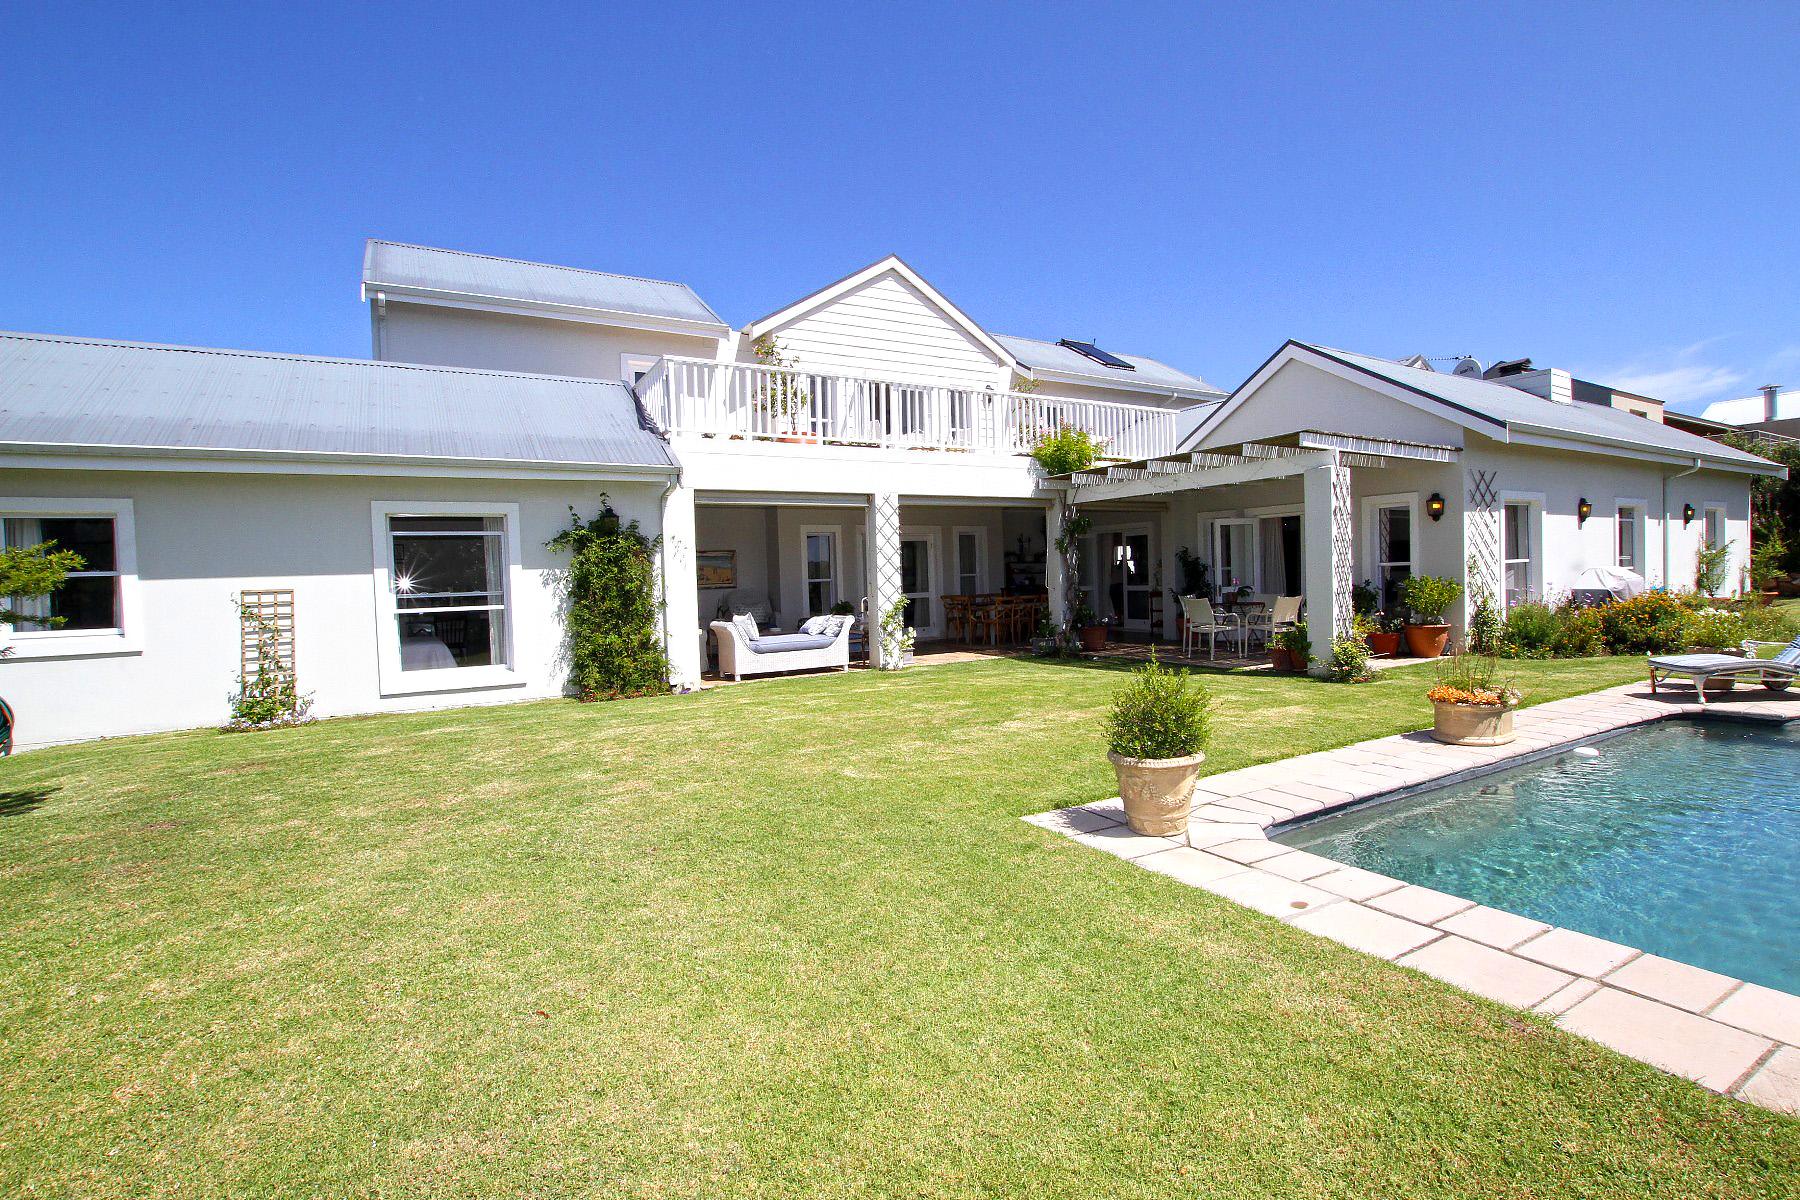 Moradia para Venda às Brackenridge Delight Plettenberg Bay, Western Cape, 6600 África Do Sul